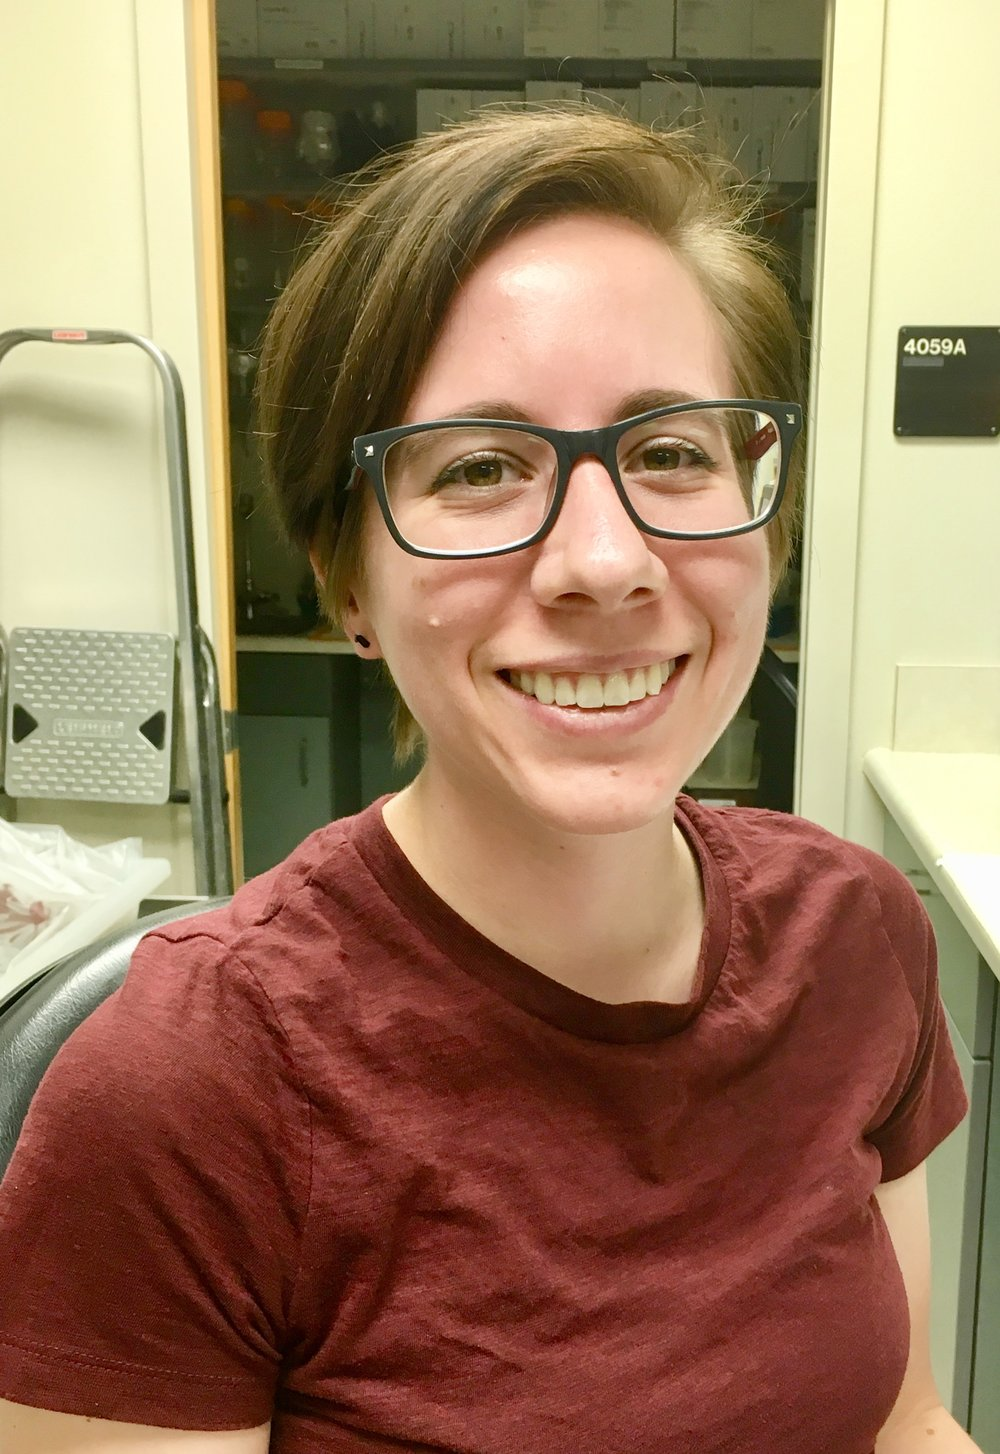 Kristin Rosche, M.S. - Scientific Assistantkristin.rosche [at] wsu [dot] eduM.S.: Southern Illinois University—CarbondaleB.S.: University of Wisconsin—Eau Claire